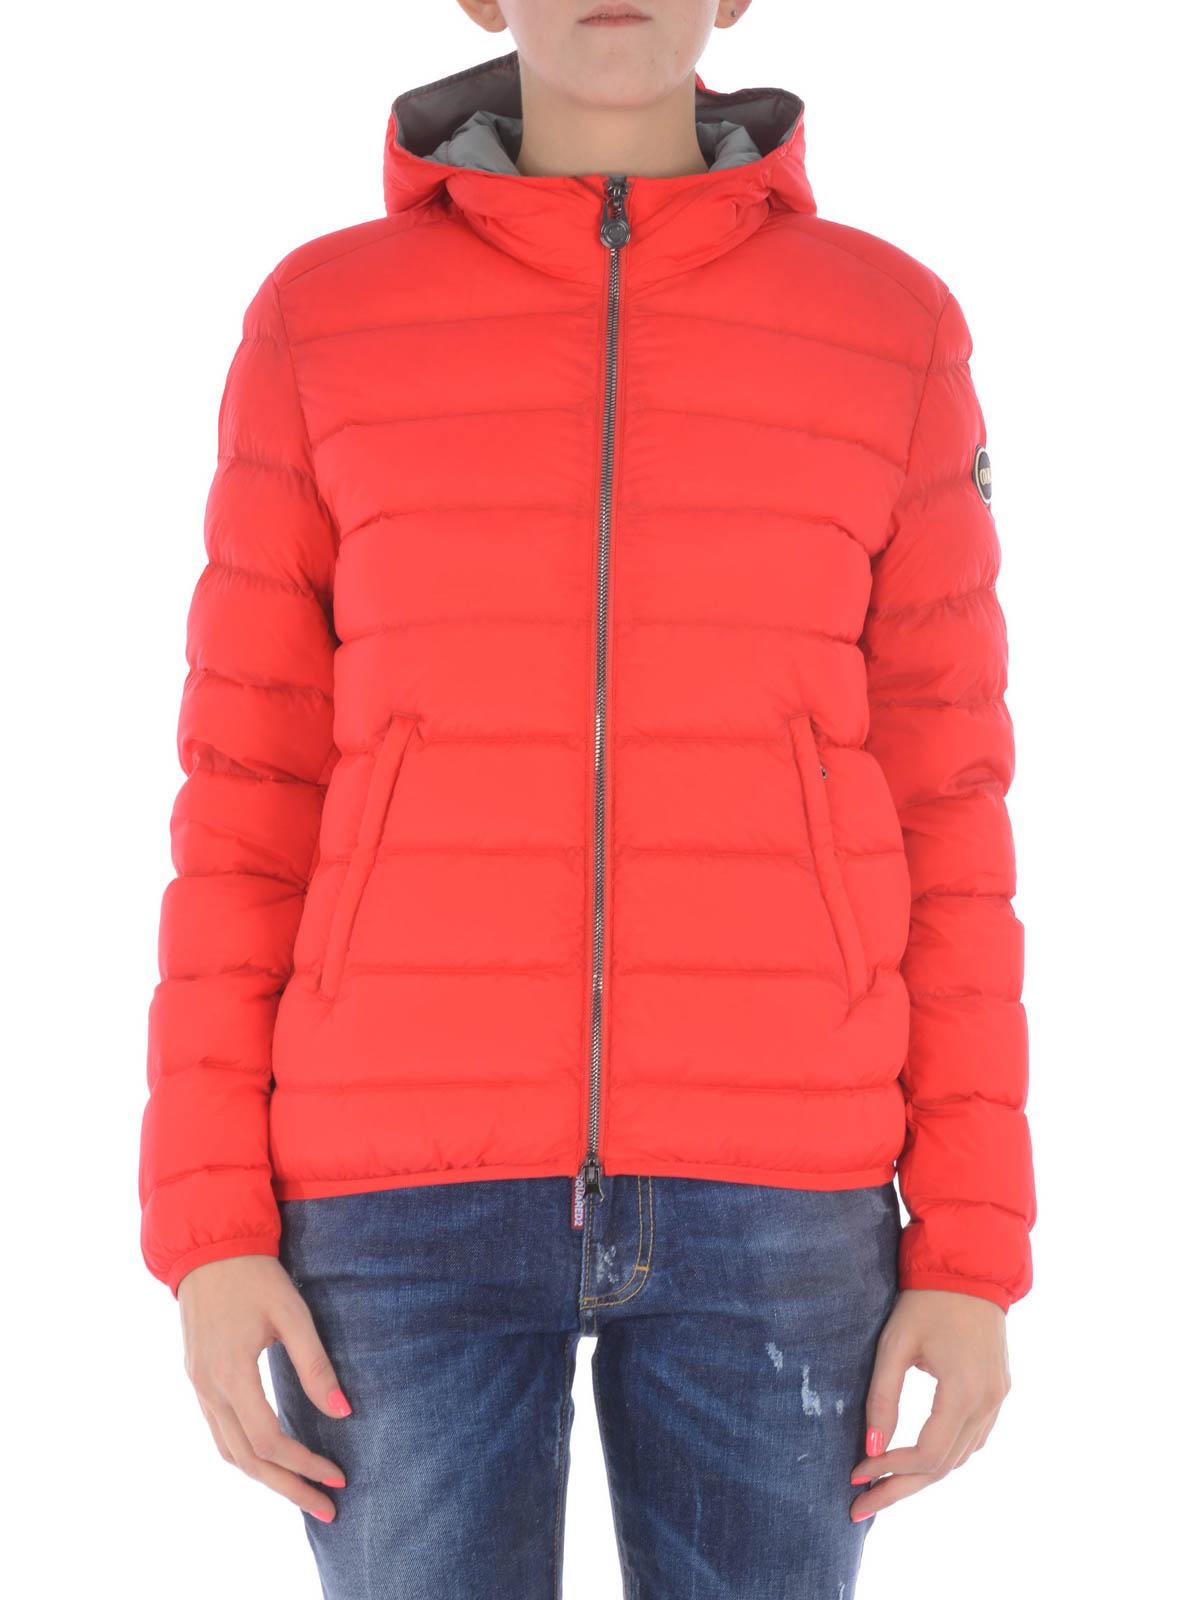 Rot Daunenmantel Damen Originals Fur Colmar Langer W9DYH2EI